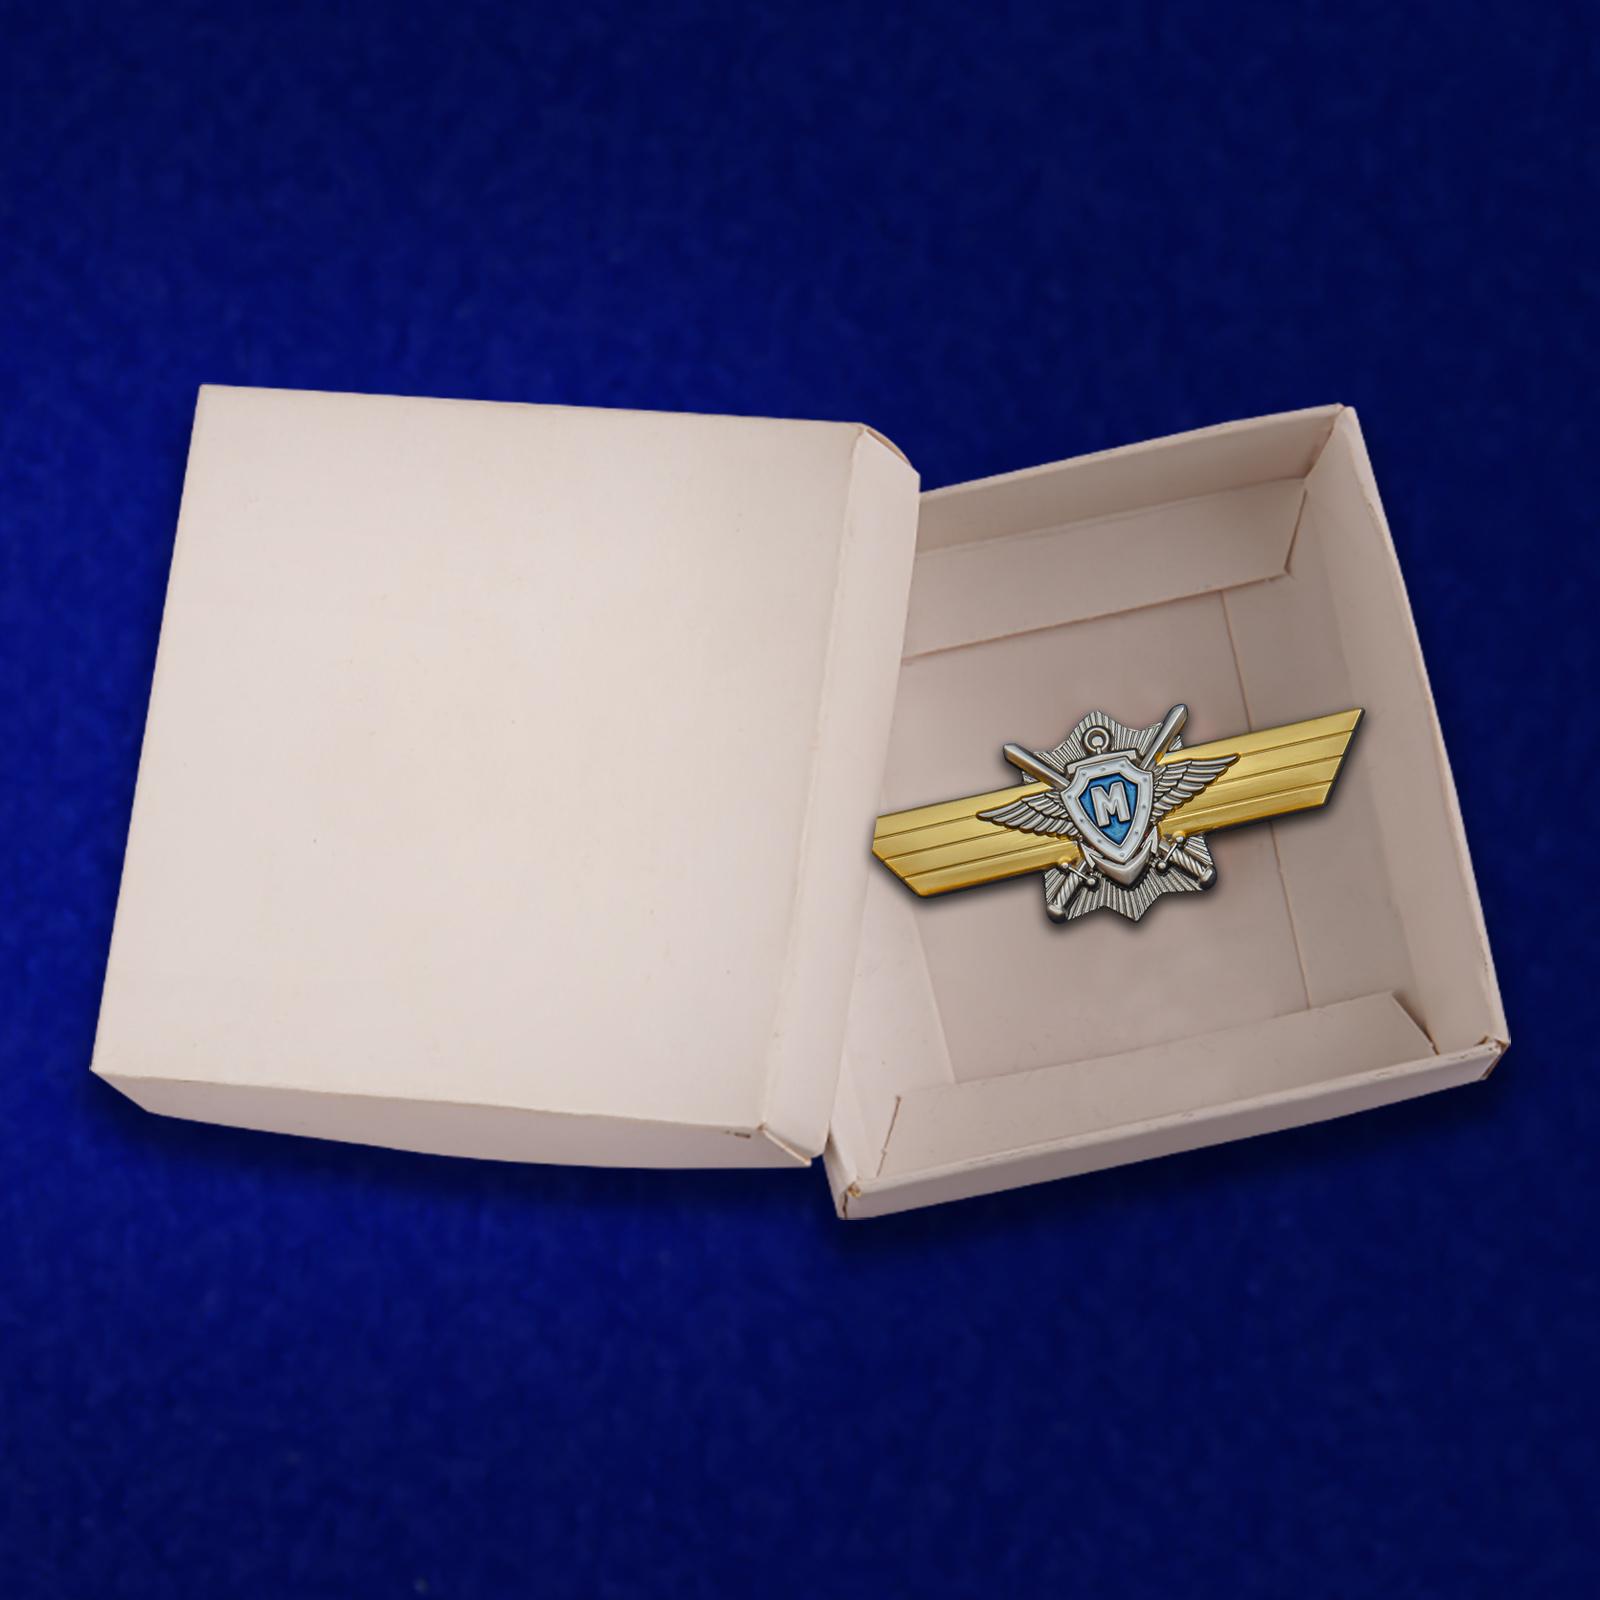 Знак МО РФ Классная квалификация Мастер - в коробке